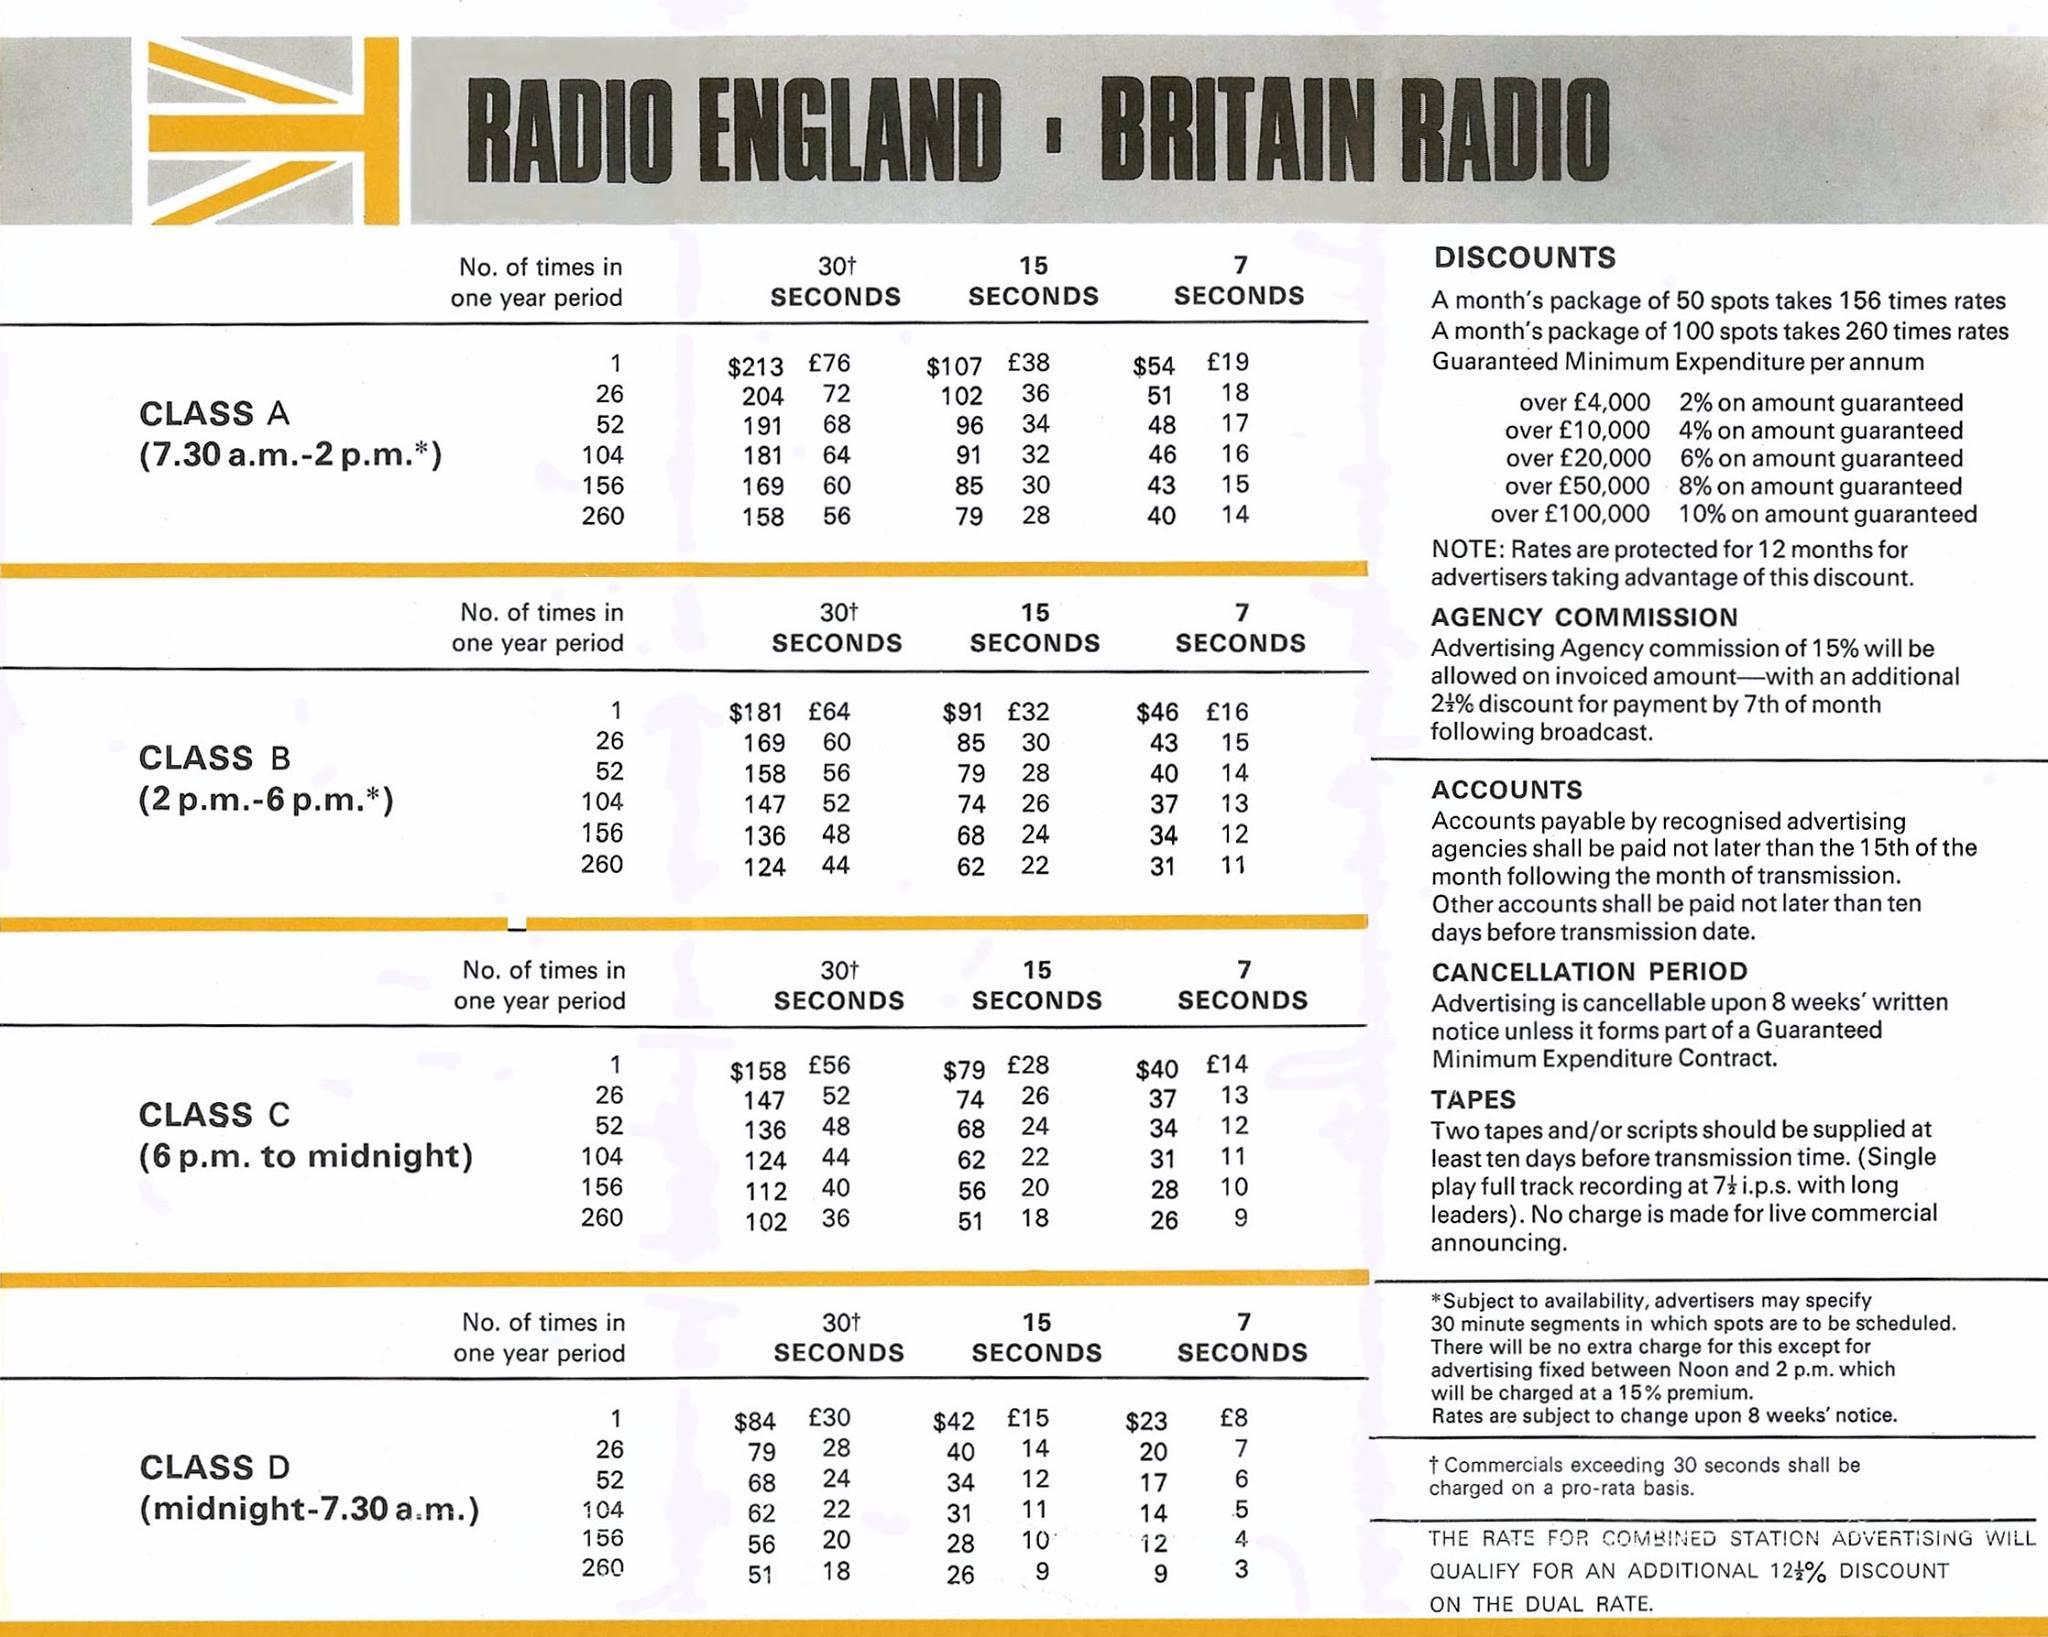 196604 Swinging Radio England raid card 2.jpg